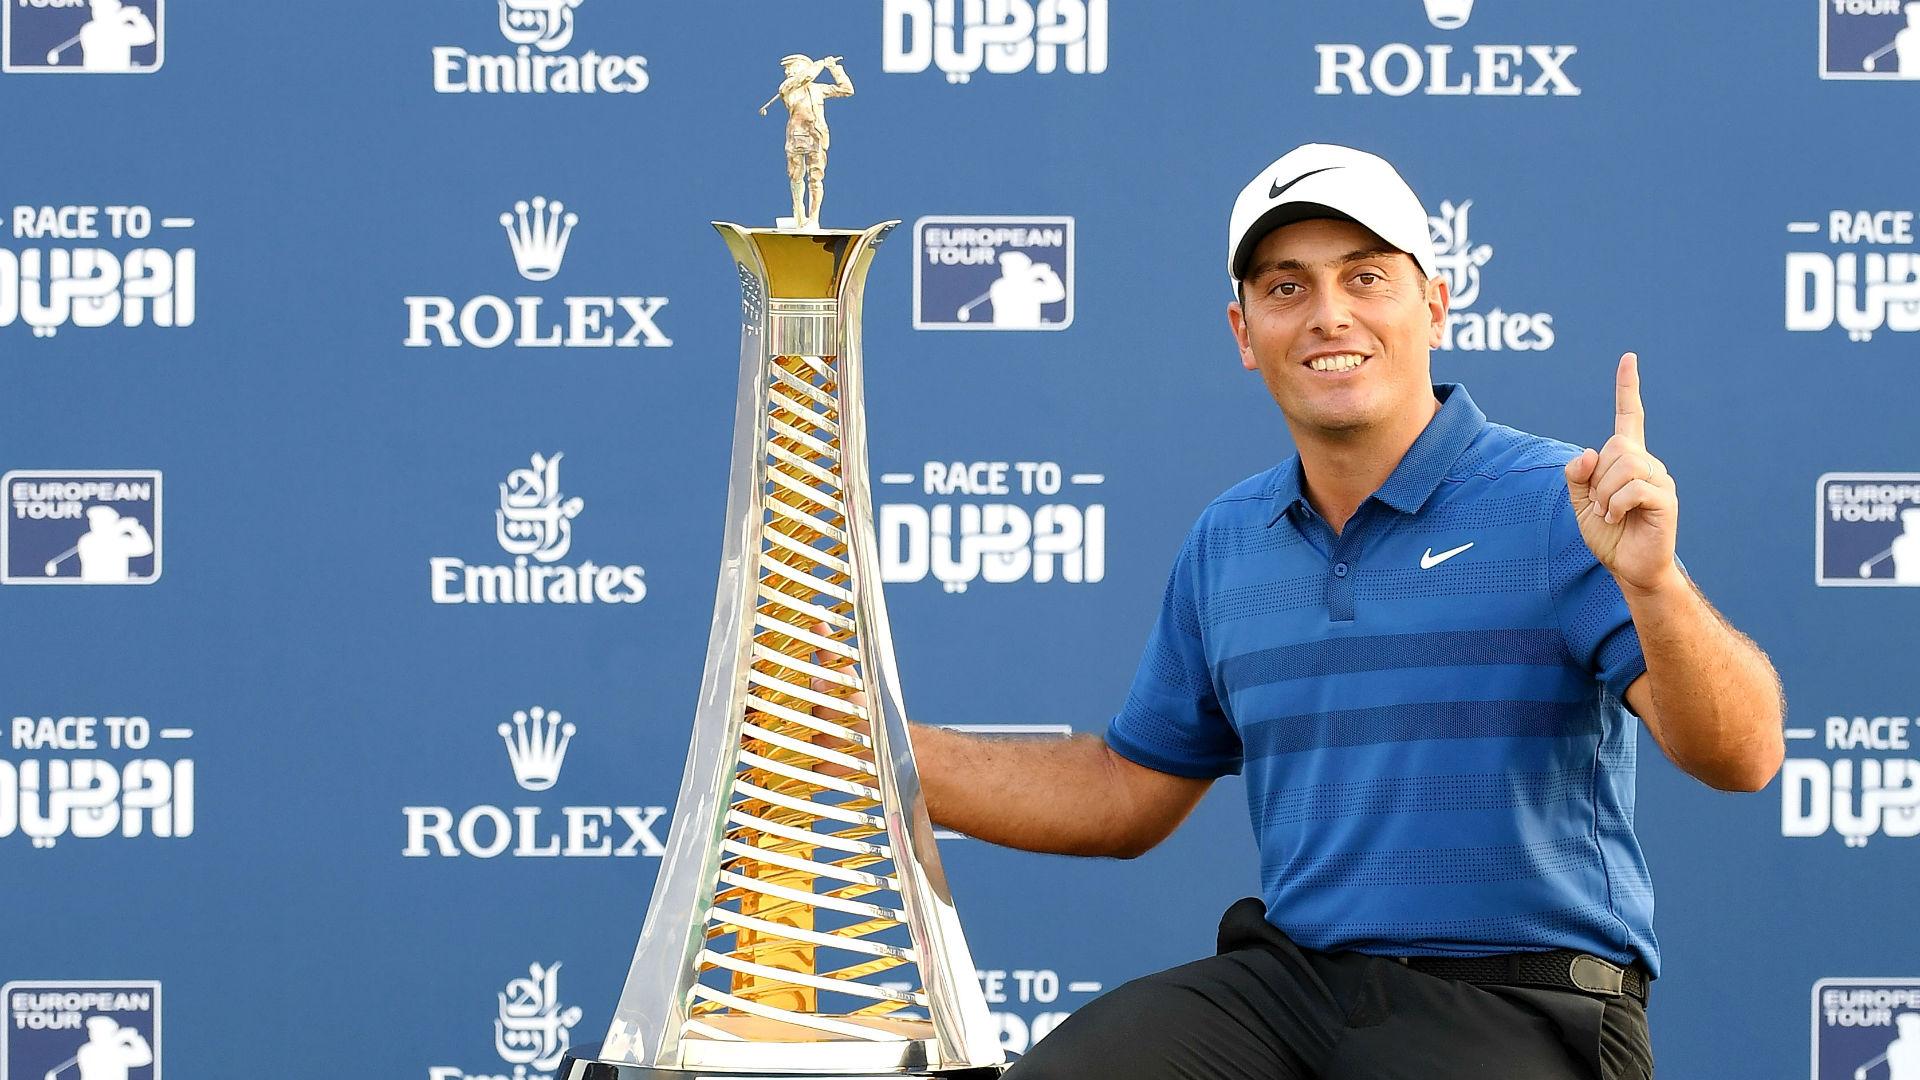 Francesco Molinari named European Golfer of the Year